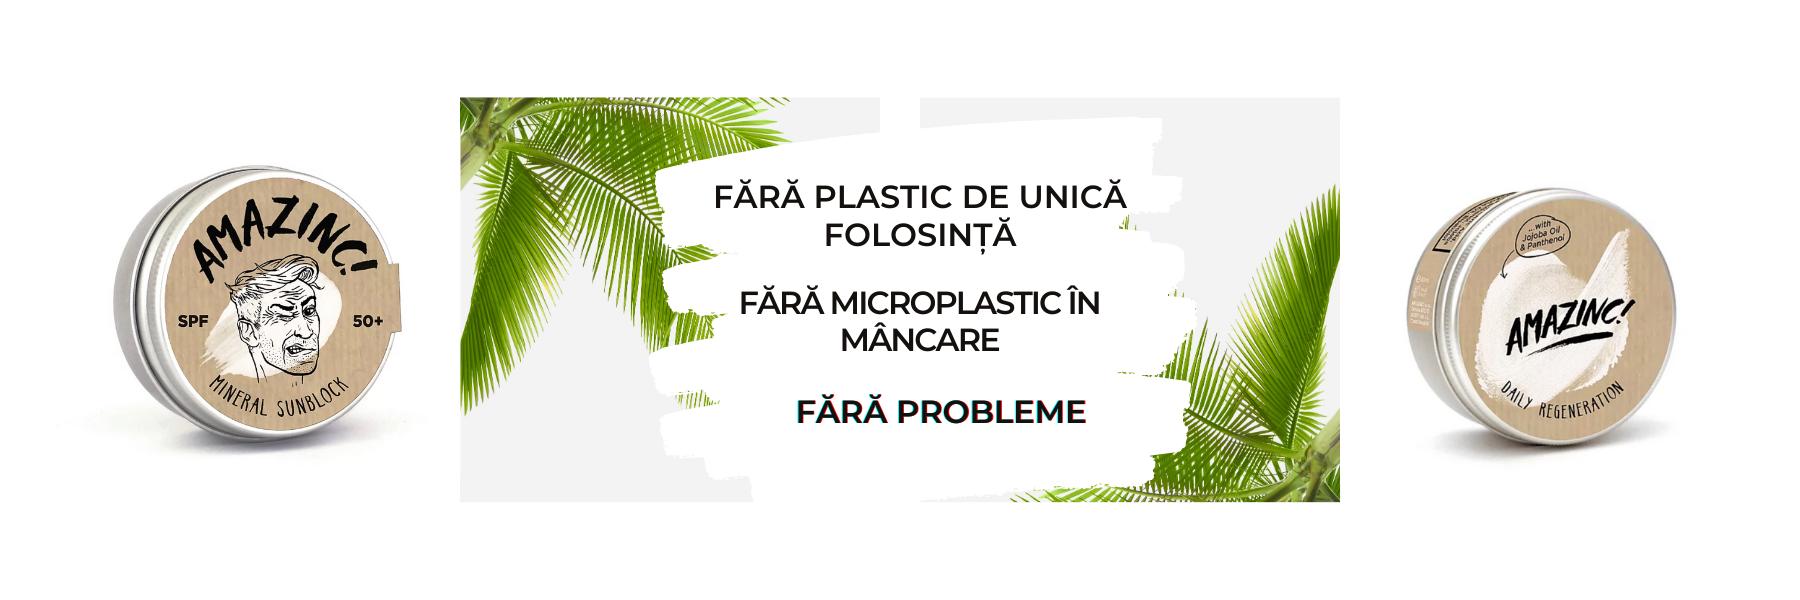 fara_plastic